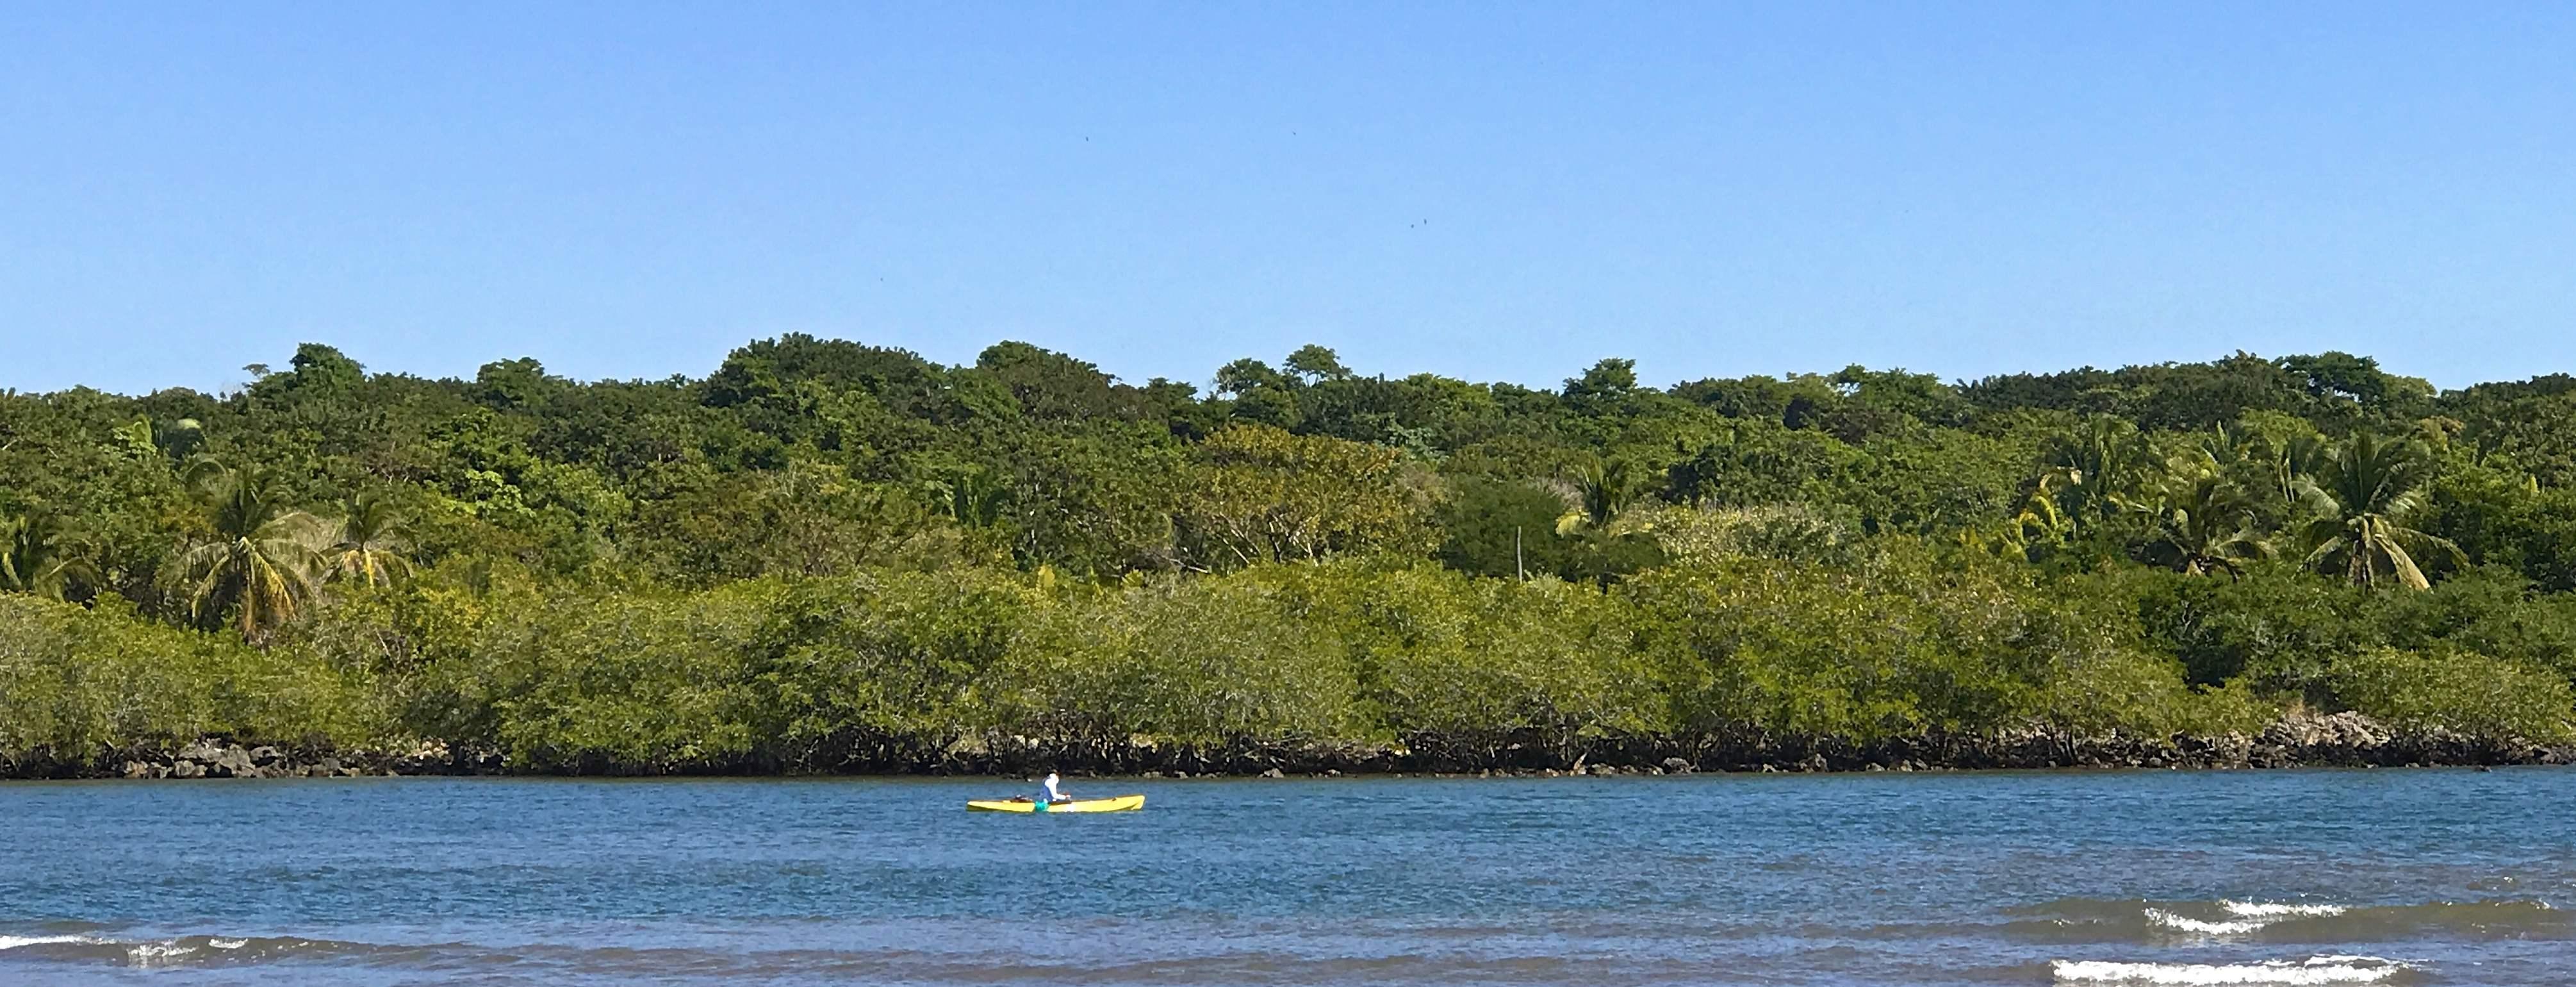 SC River w kayaker